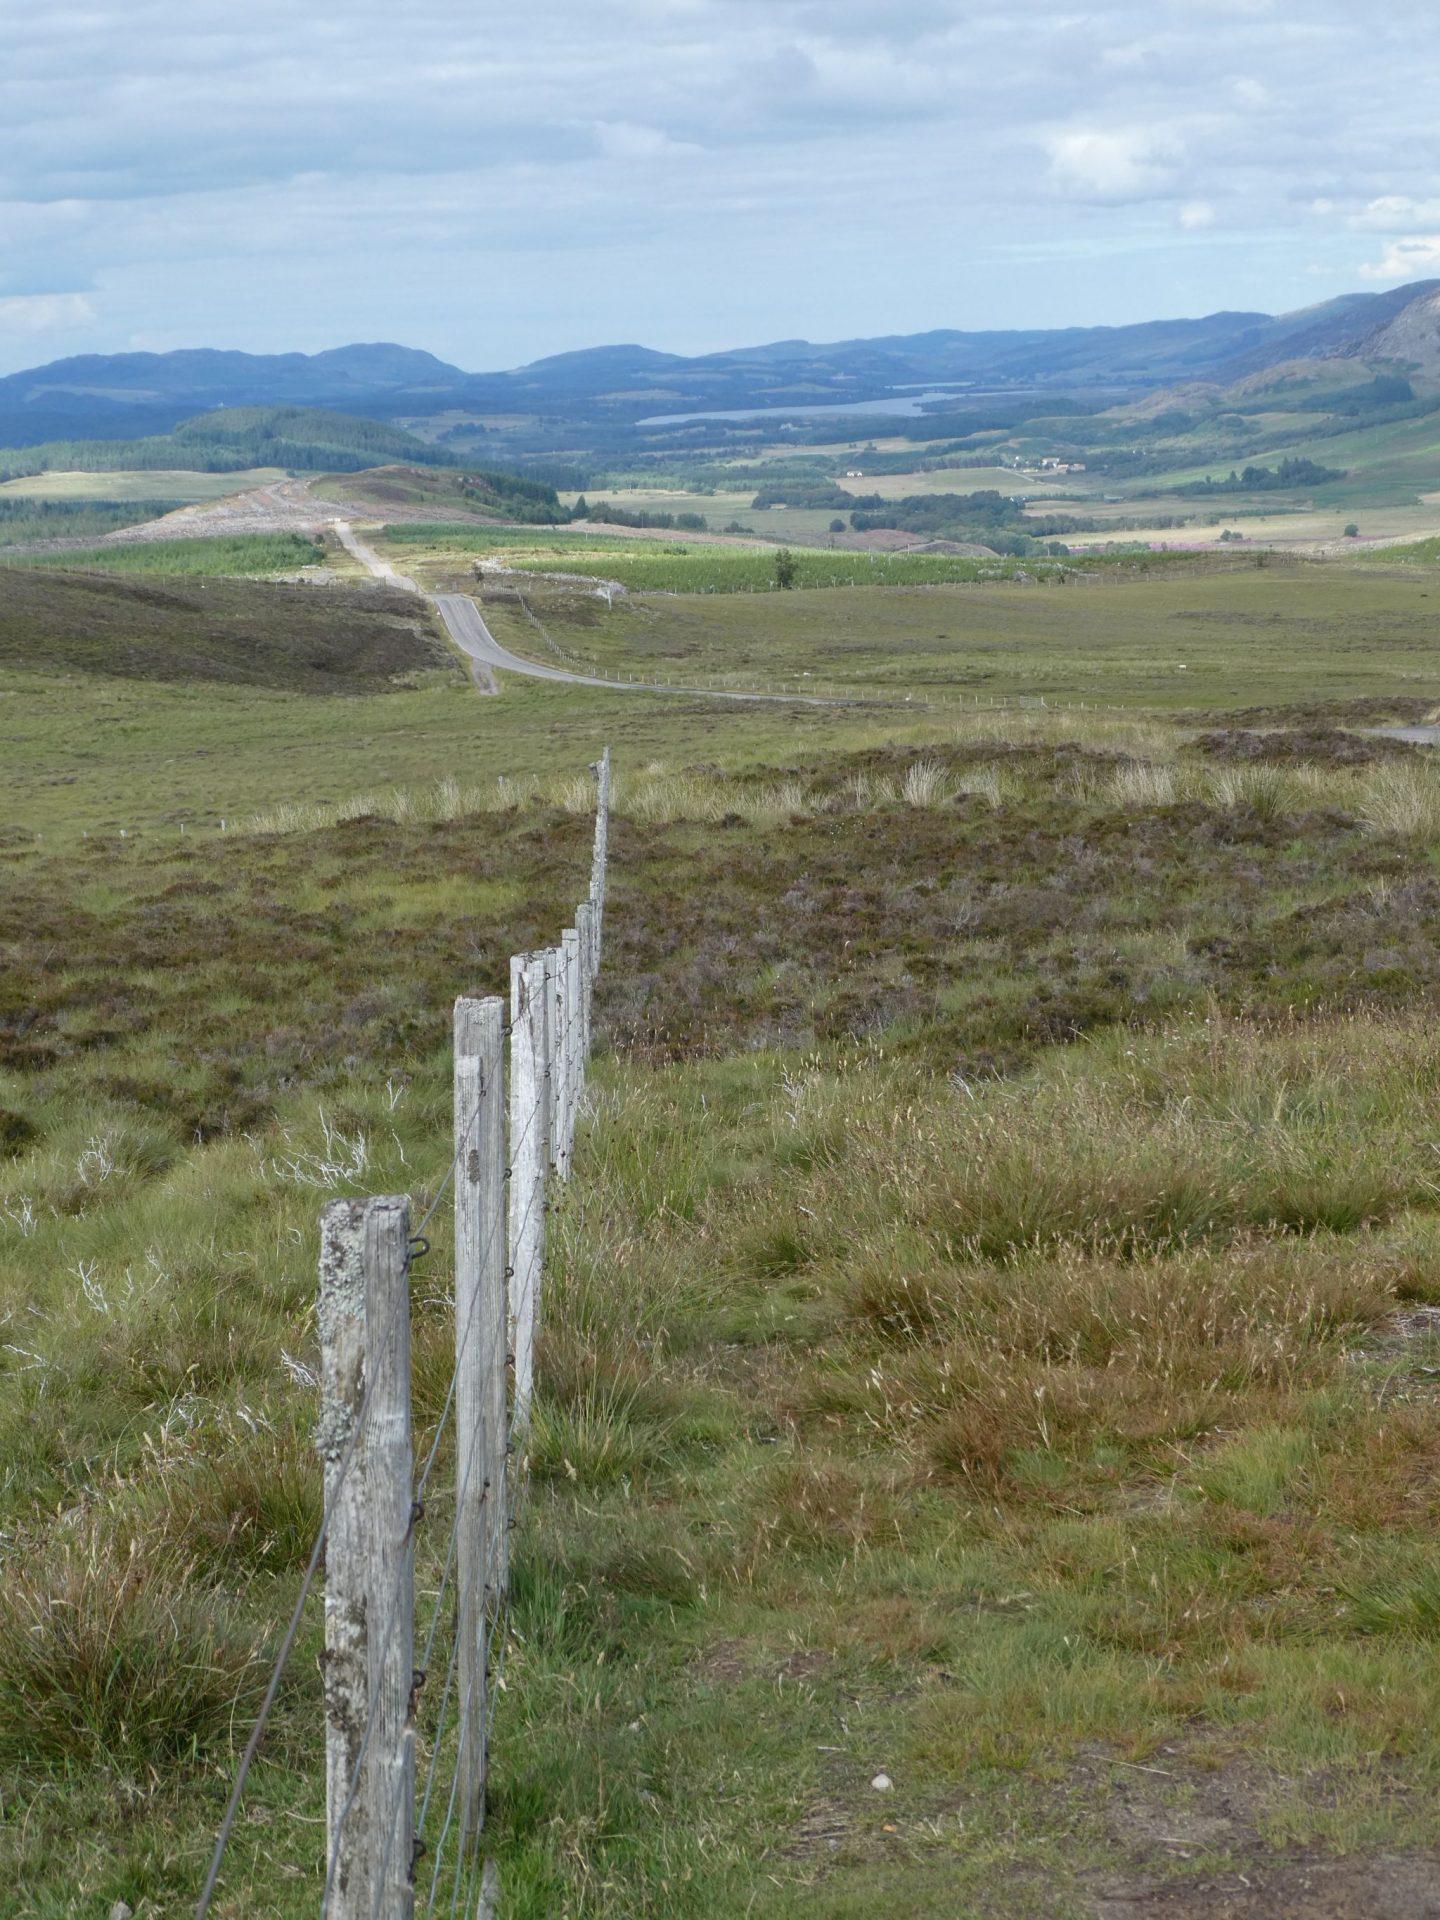 North Scotland road trip (17 to 28 July 2018)